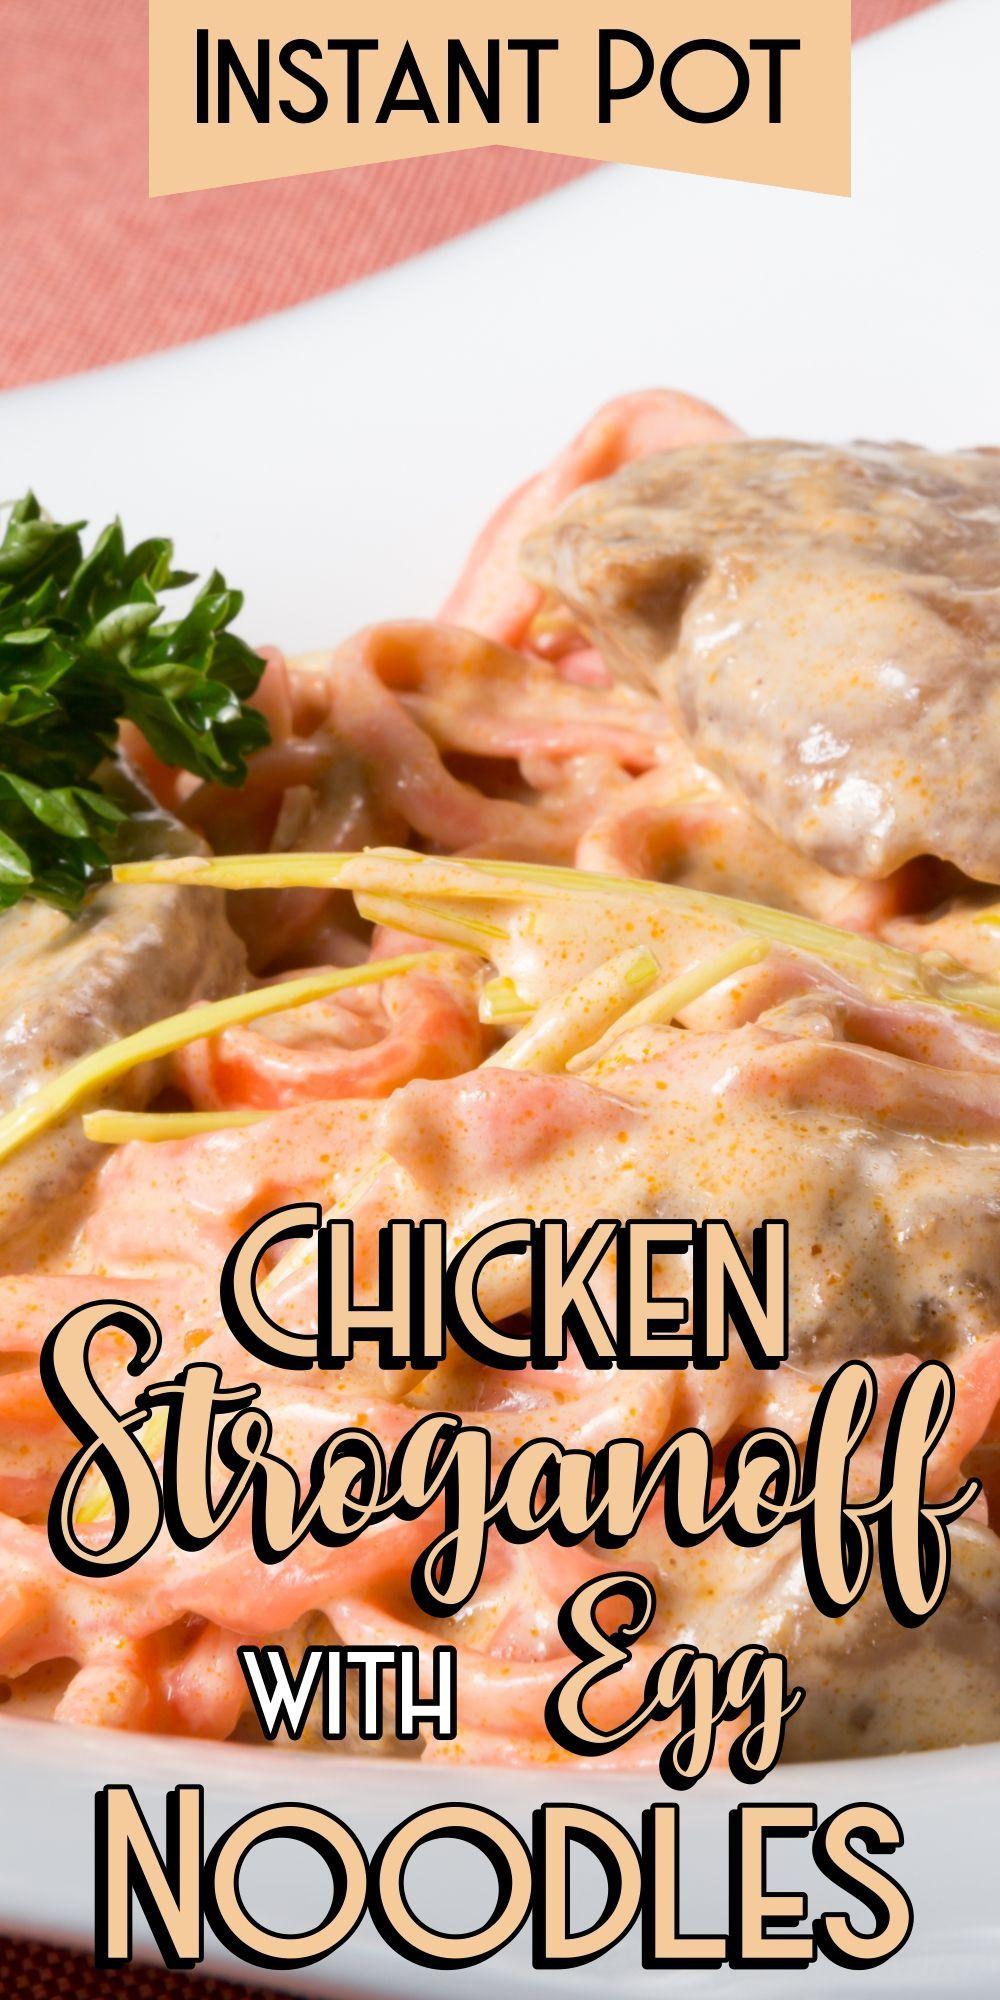 instant pot chicken stroganoff with egg noodles  recipe